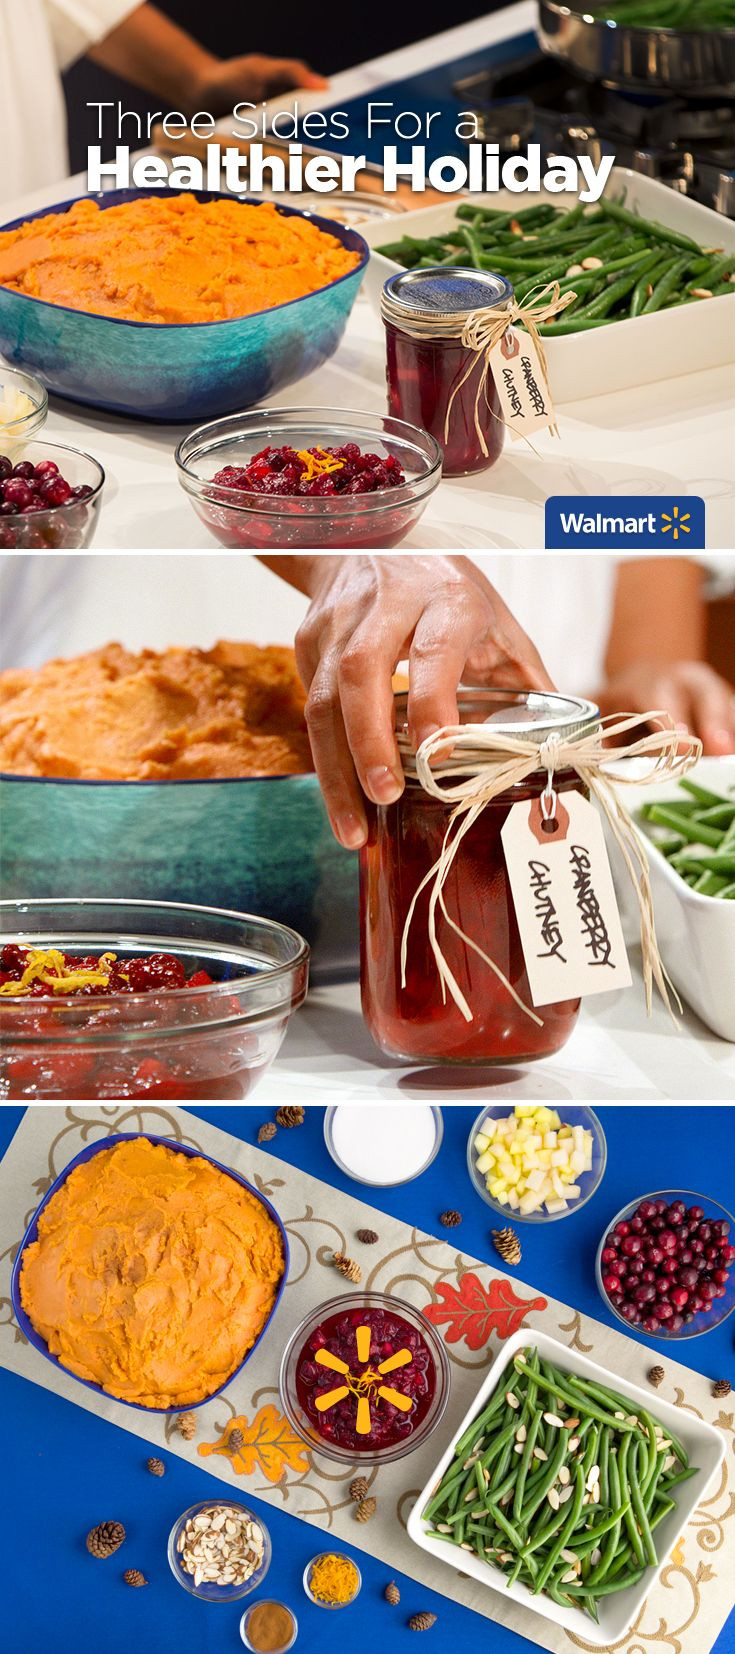 Walmart Thanksgiving Dinner  25 best Thanksgiving images by Walmart on Pinterest